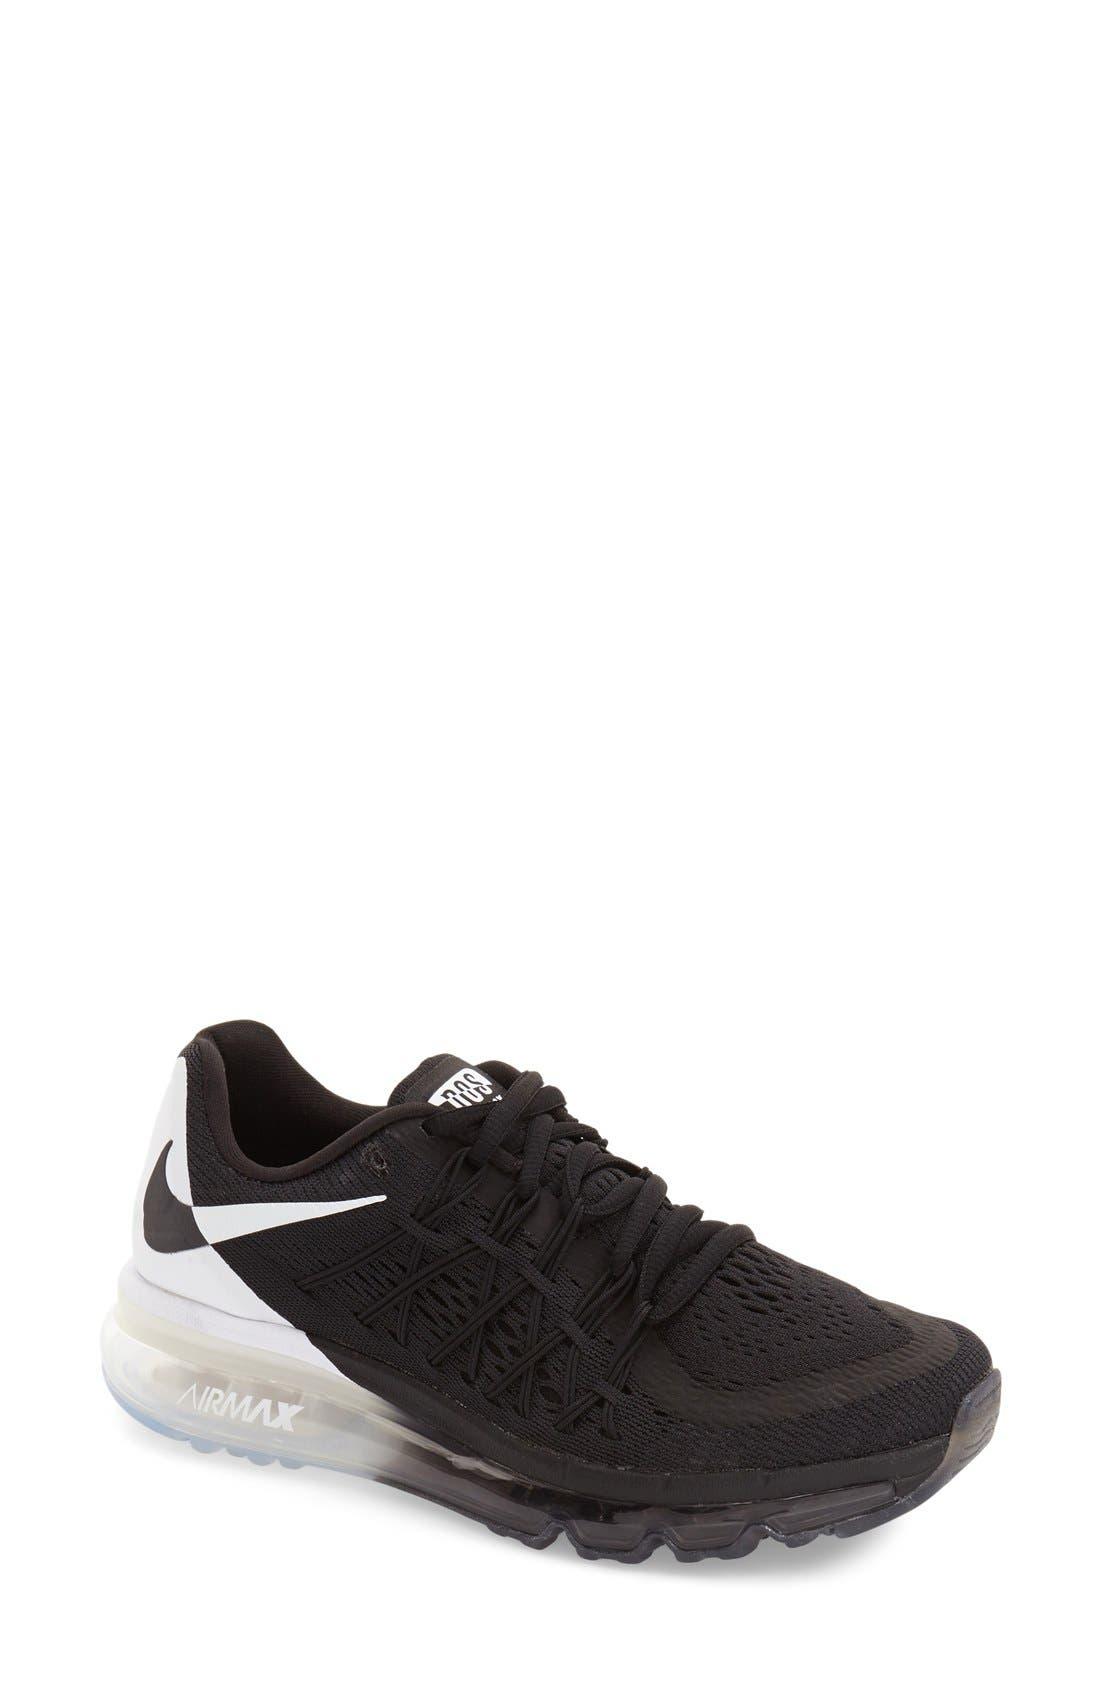 Main Image - Nike 'Air Max 2015 DOS' Running Shoe (Women)